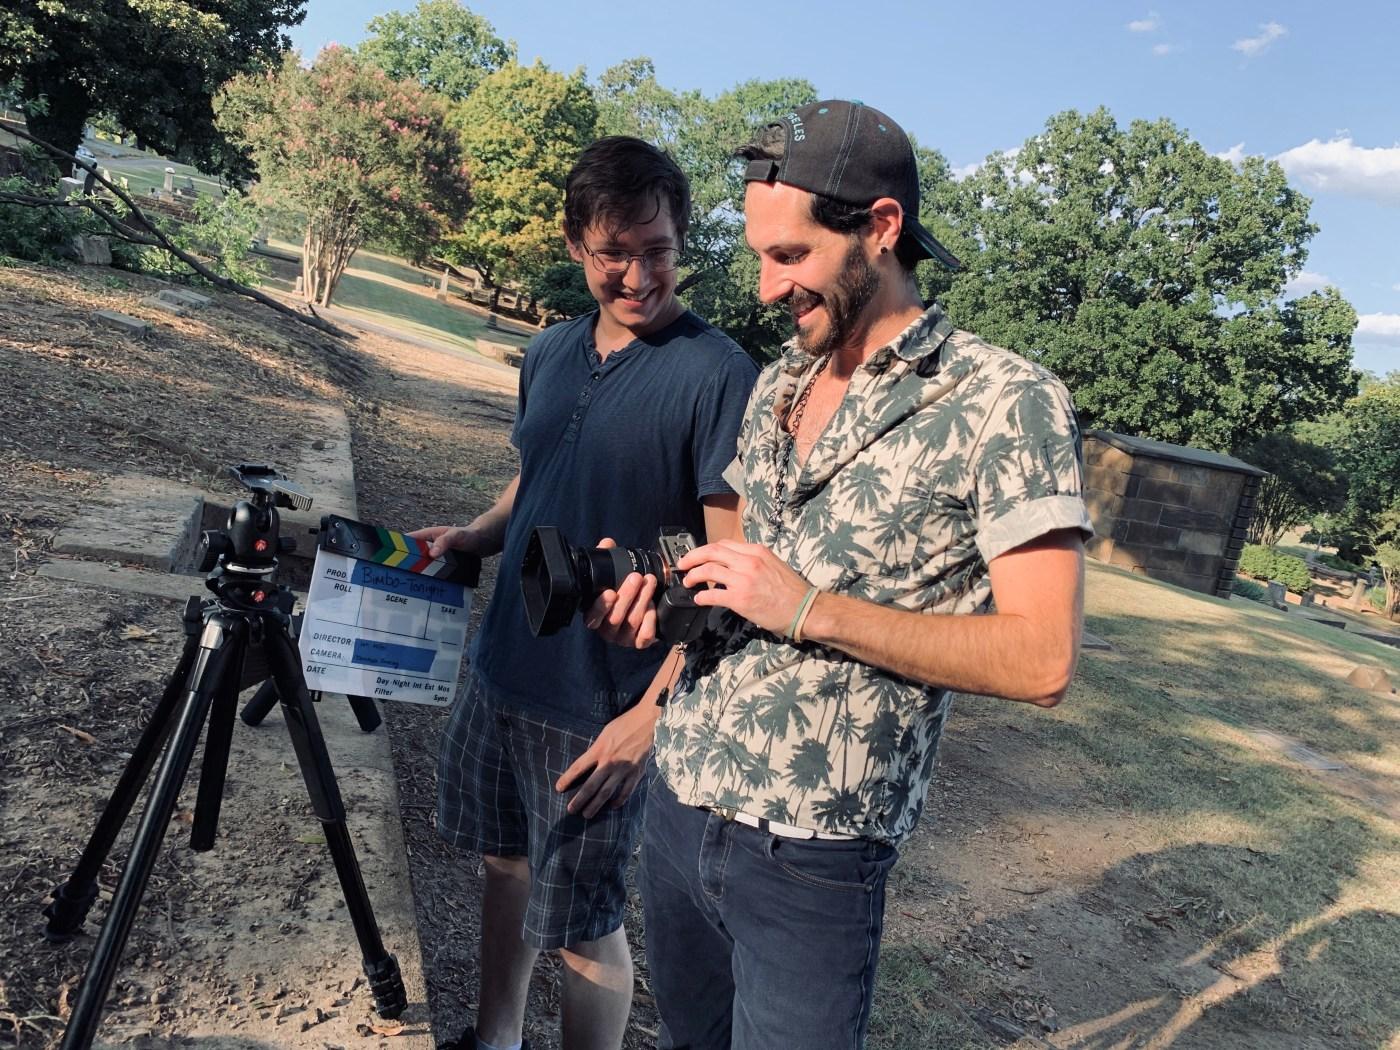 Jeremiah Fanning for Sidewalk Film Festival